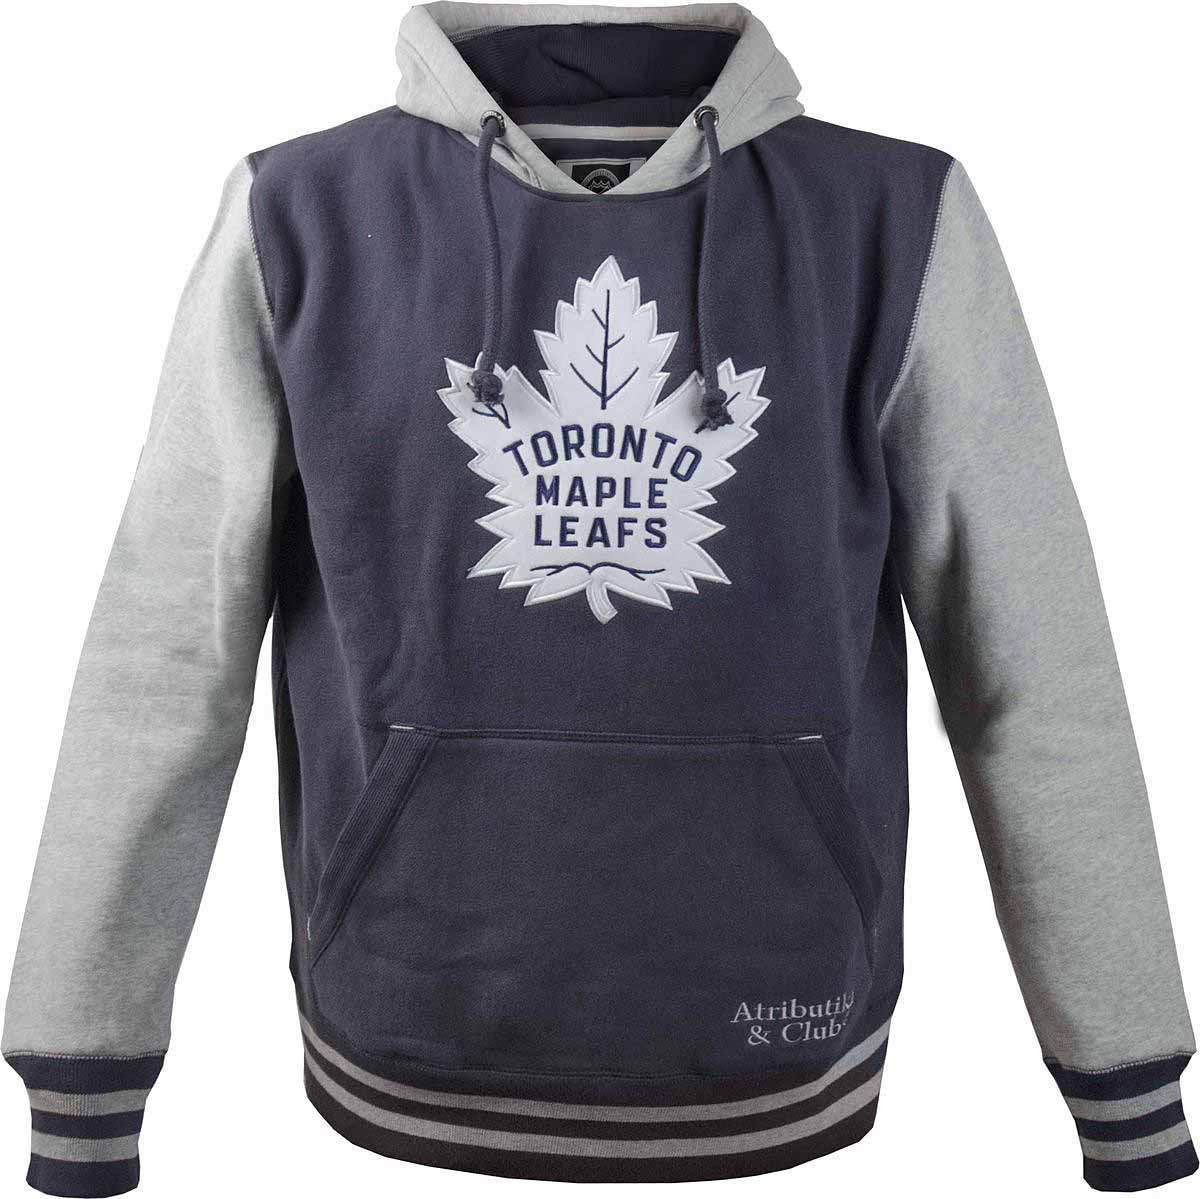 Толстовка мужская Atributika & Club Toronto Maple Leafs, цвет: синий, серый. 35820. Размер L (50/52)35820